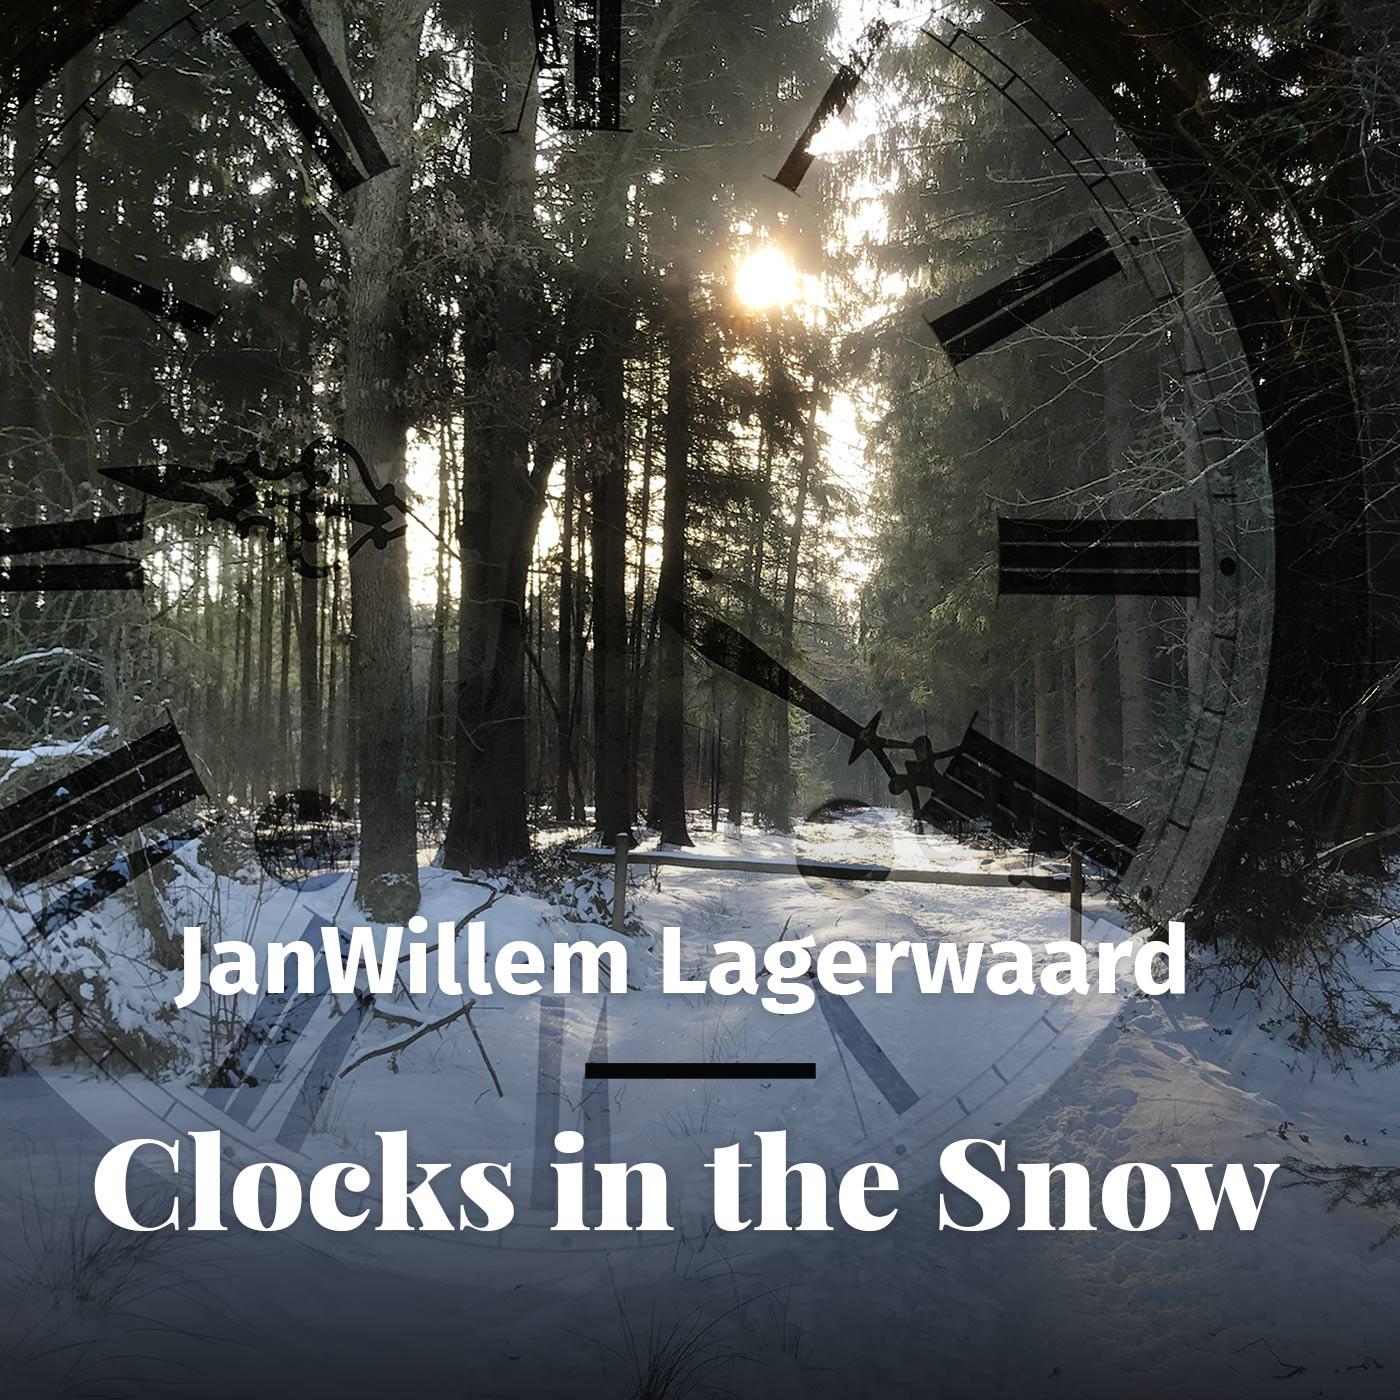 Clocks-in-the-snow.jpg